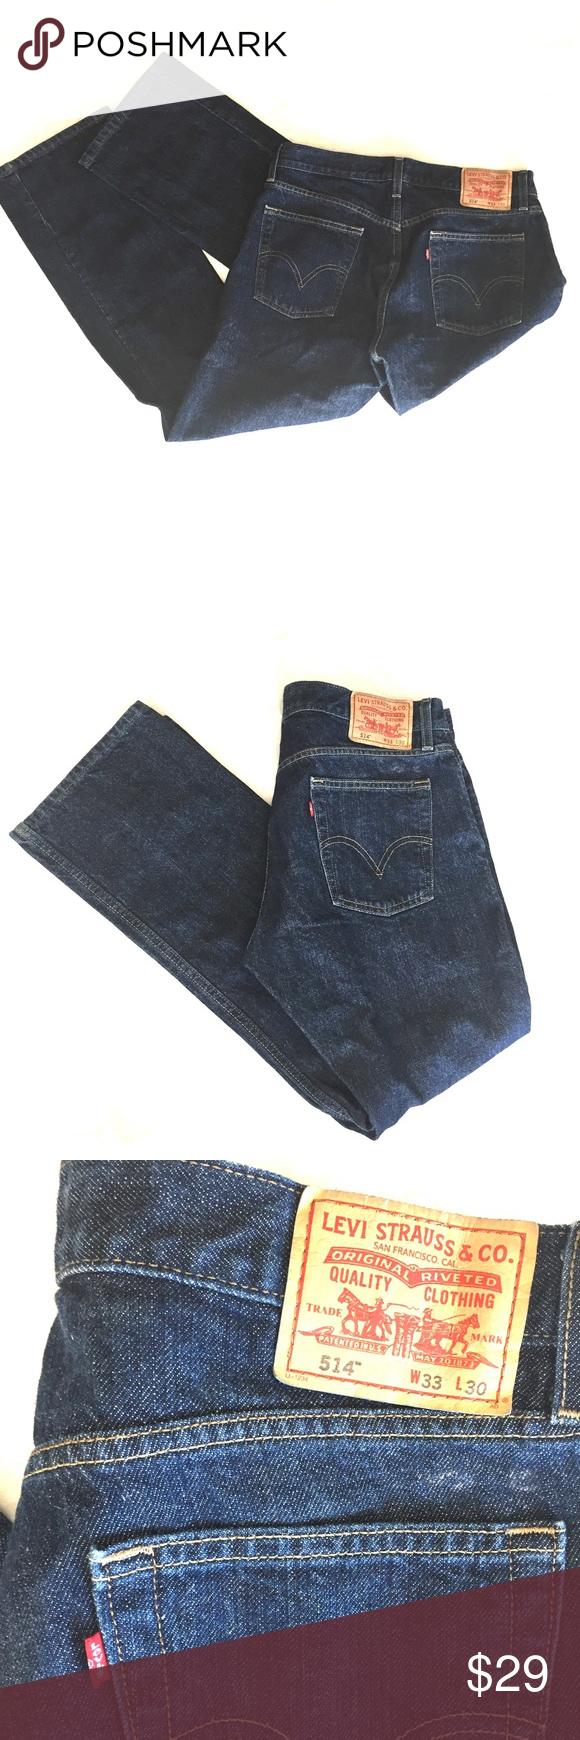 Levi's Men's 514 Slim Straight Jeans 33x30 👖 Levi's 514 Slim Straight in excellent condition.  Darker wash.  33X30 Levi's Jeans Slim Straight